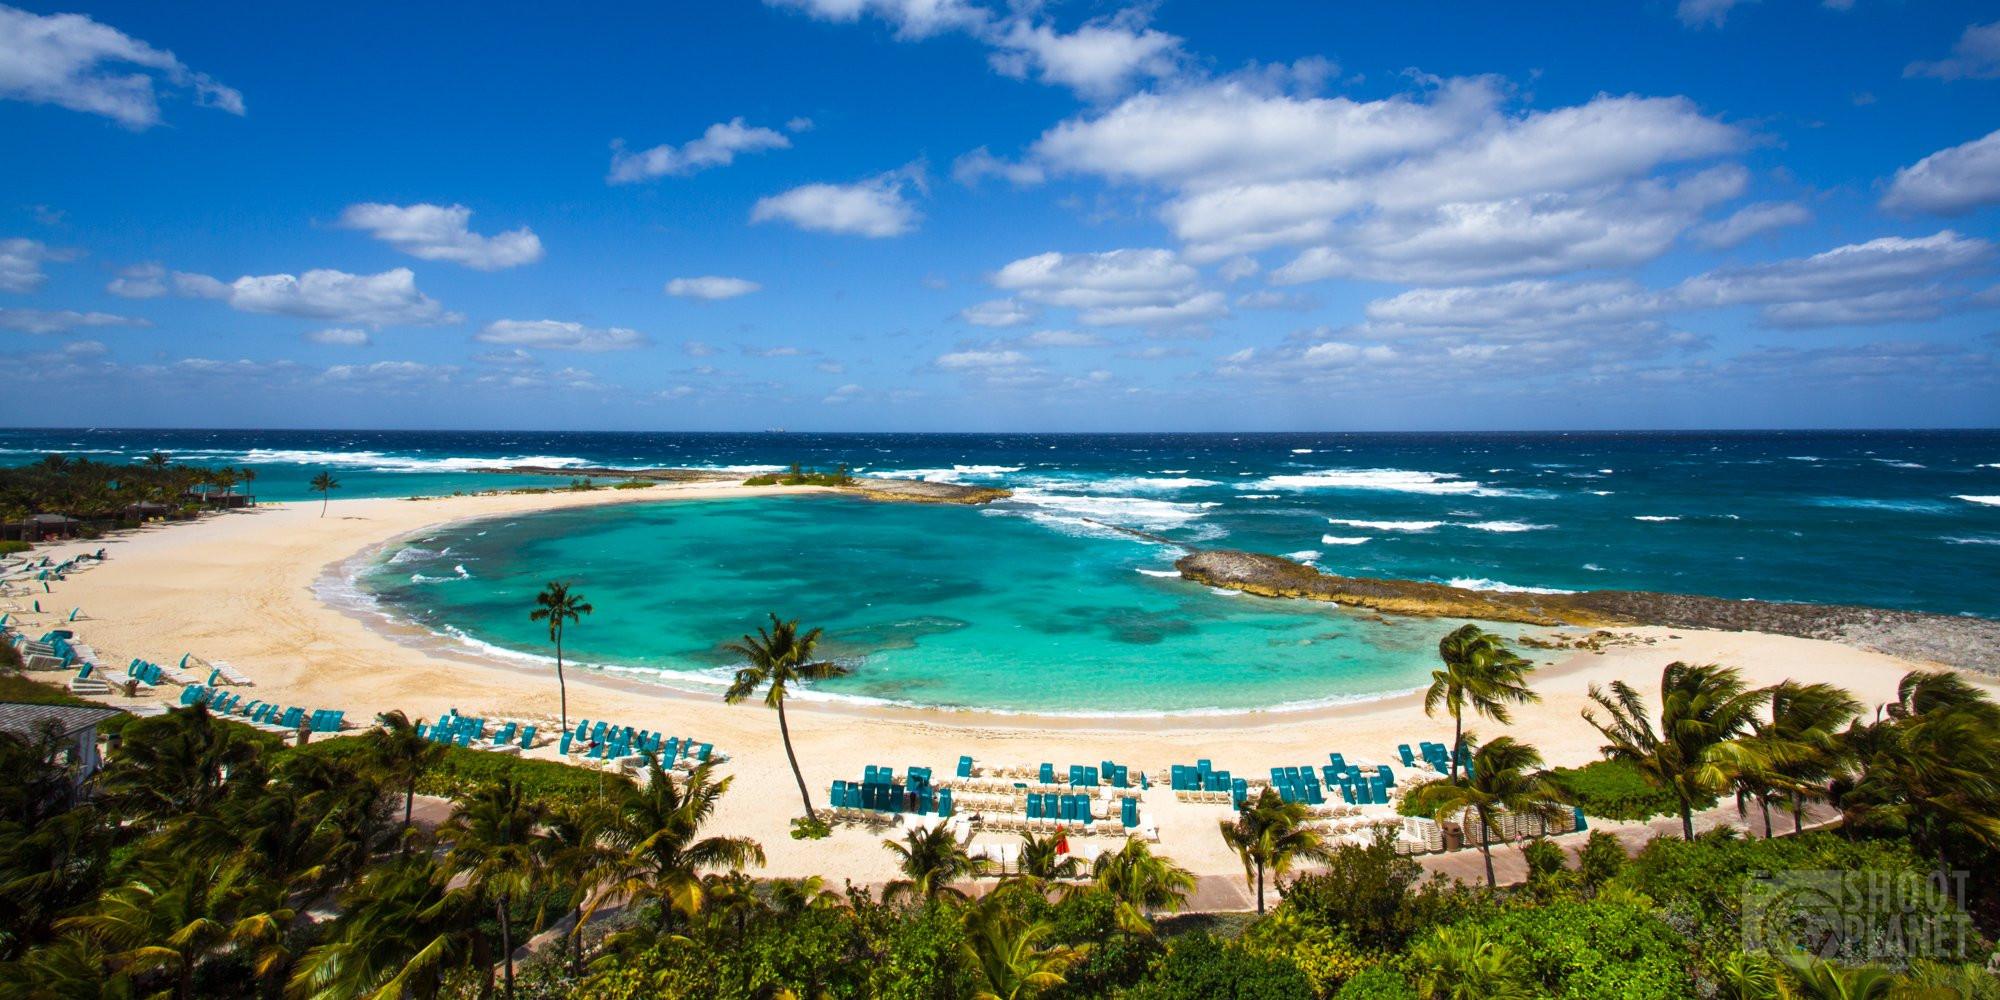 Cove Beach lagoon, Paradise Island, Bahamas